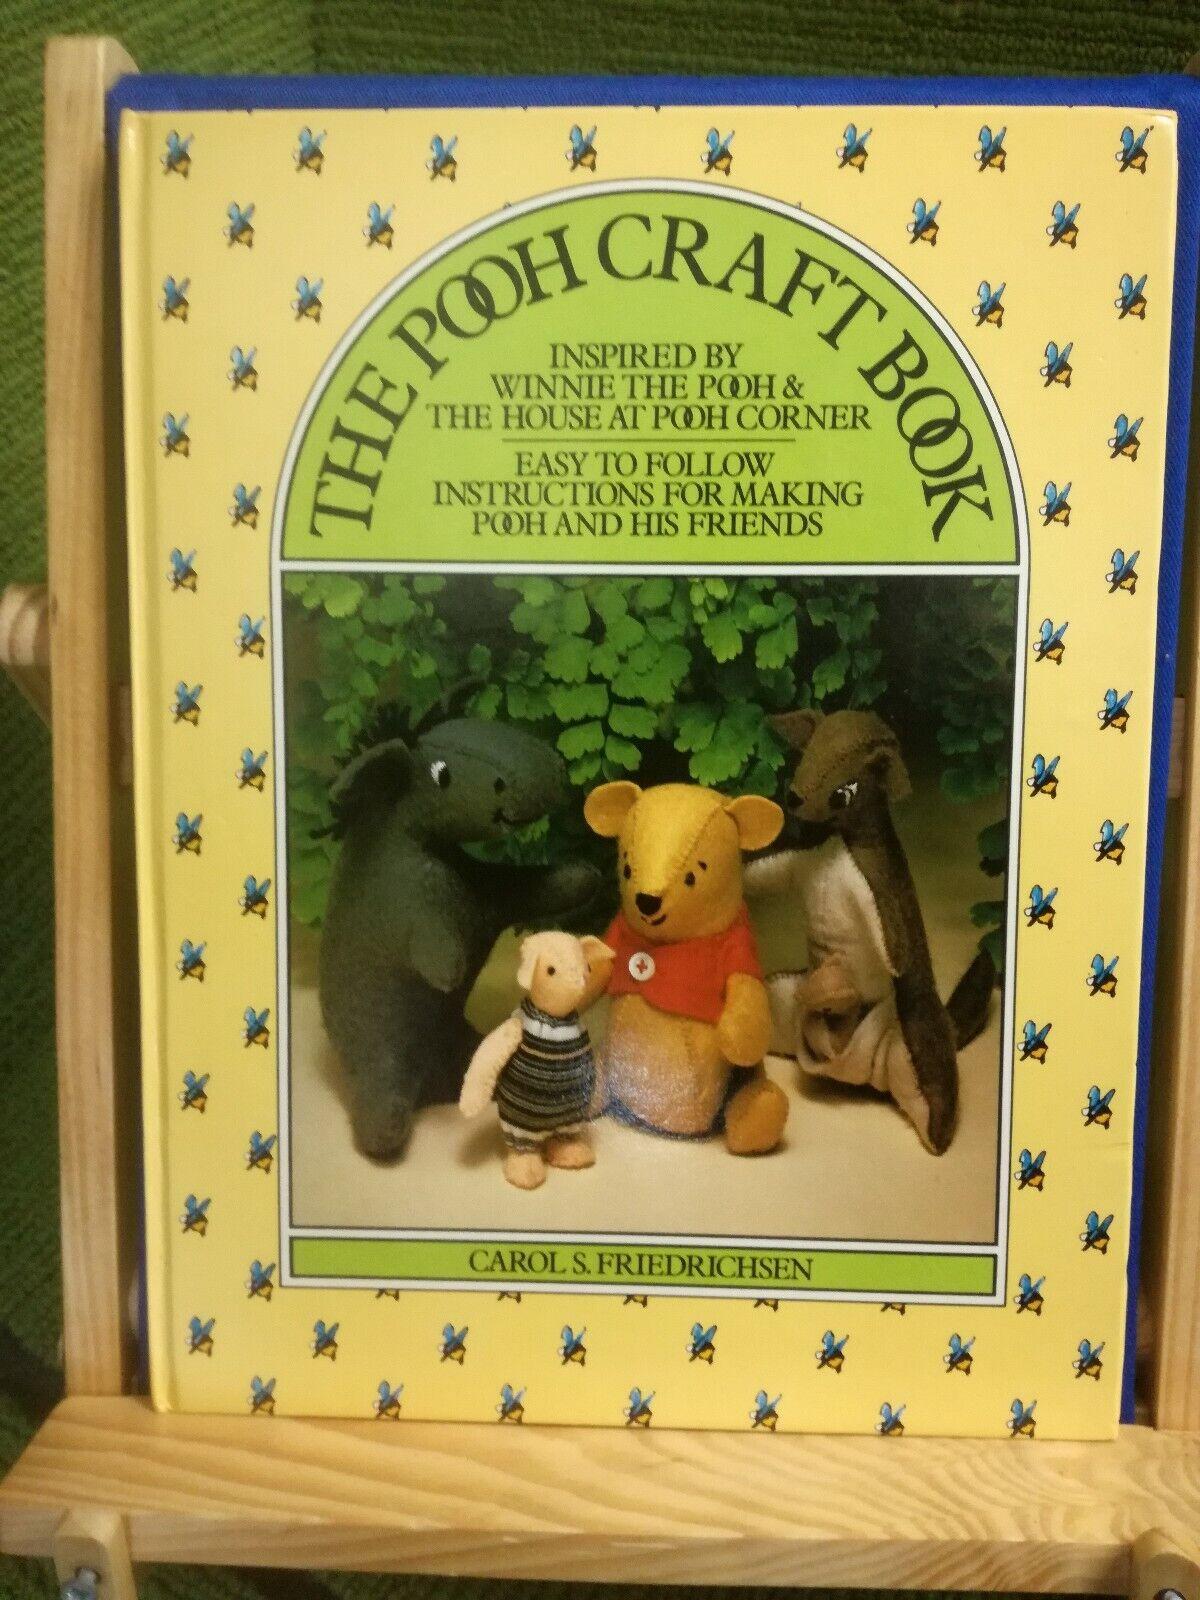 THE POOH CRAFT BOOK - CAROL S S S FRIEDRICHSEN - 1982 1st Ed HARDBACK BOOK - LOVELY b937e3